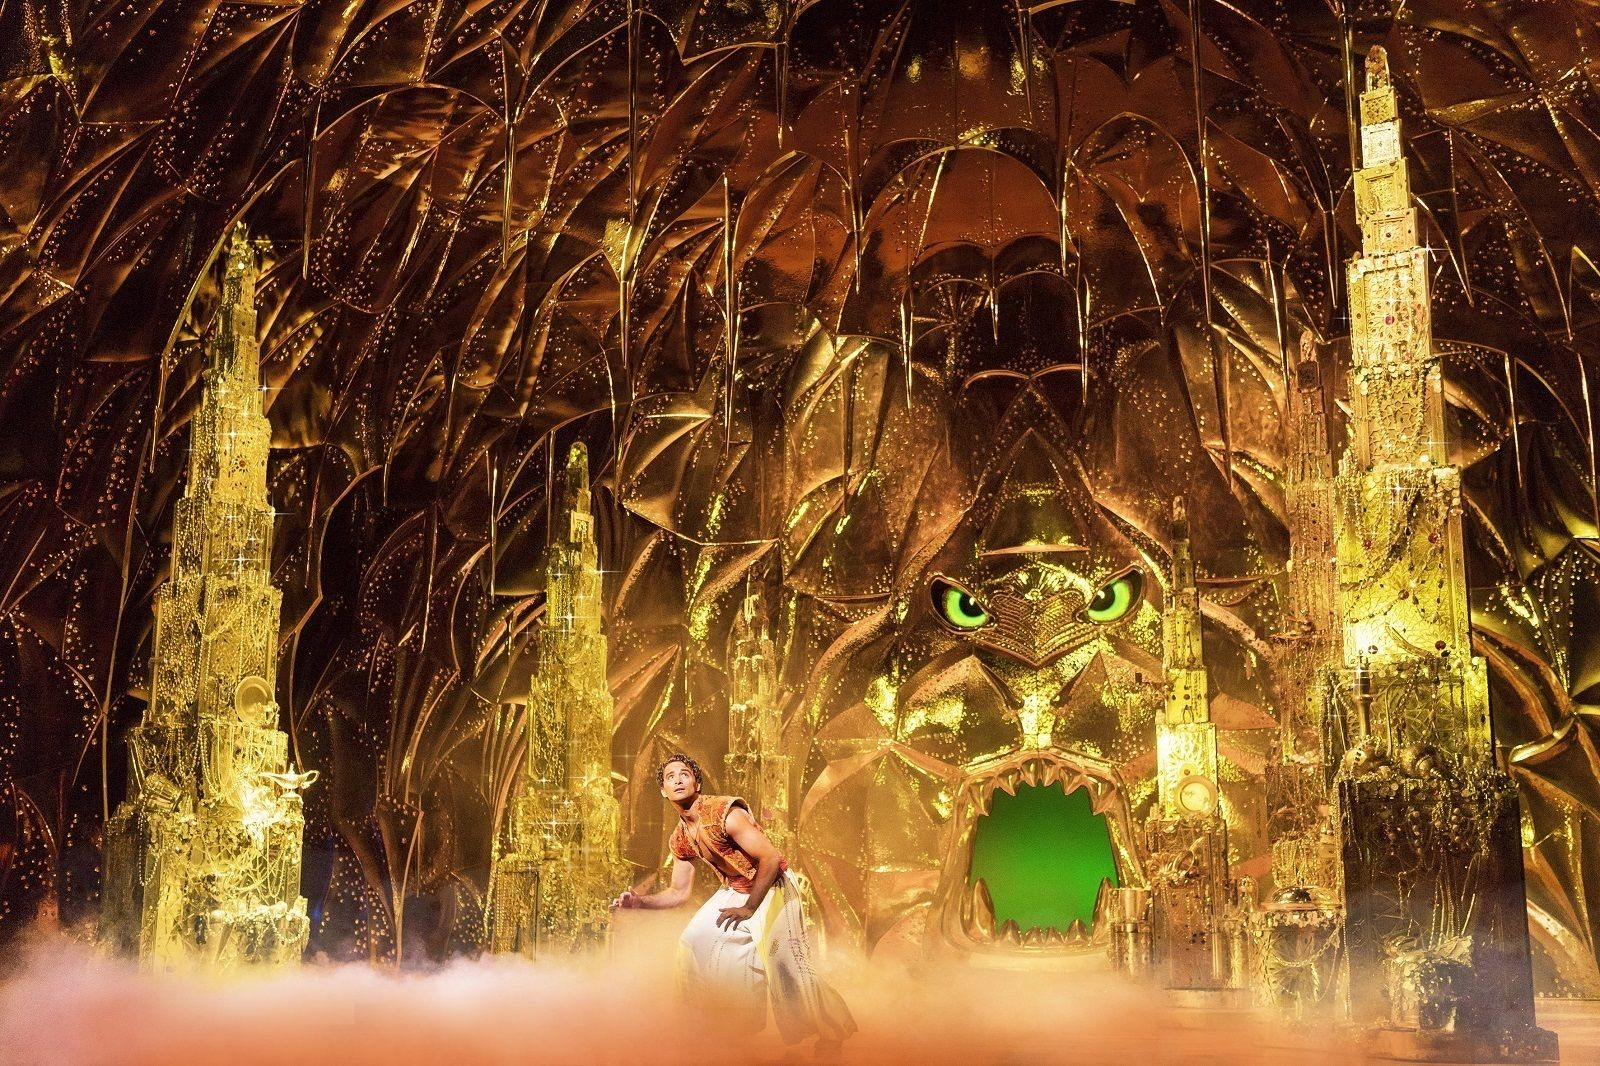 01 Aladdin (Matthew Croke) inside the Cave of Wonders - photo by Deen van Meer -® Disney.jpg